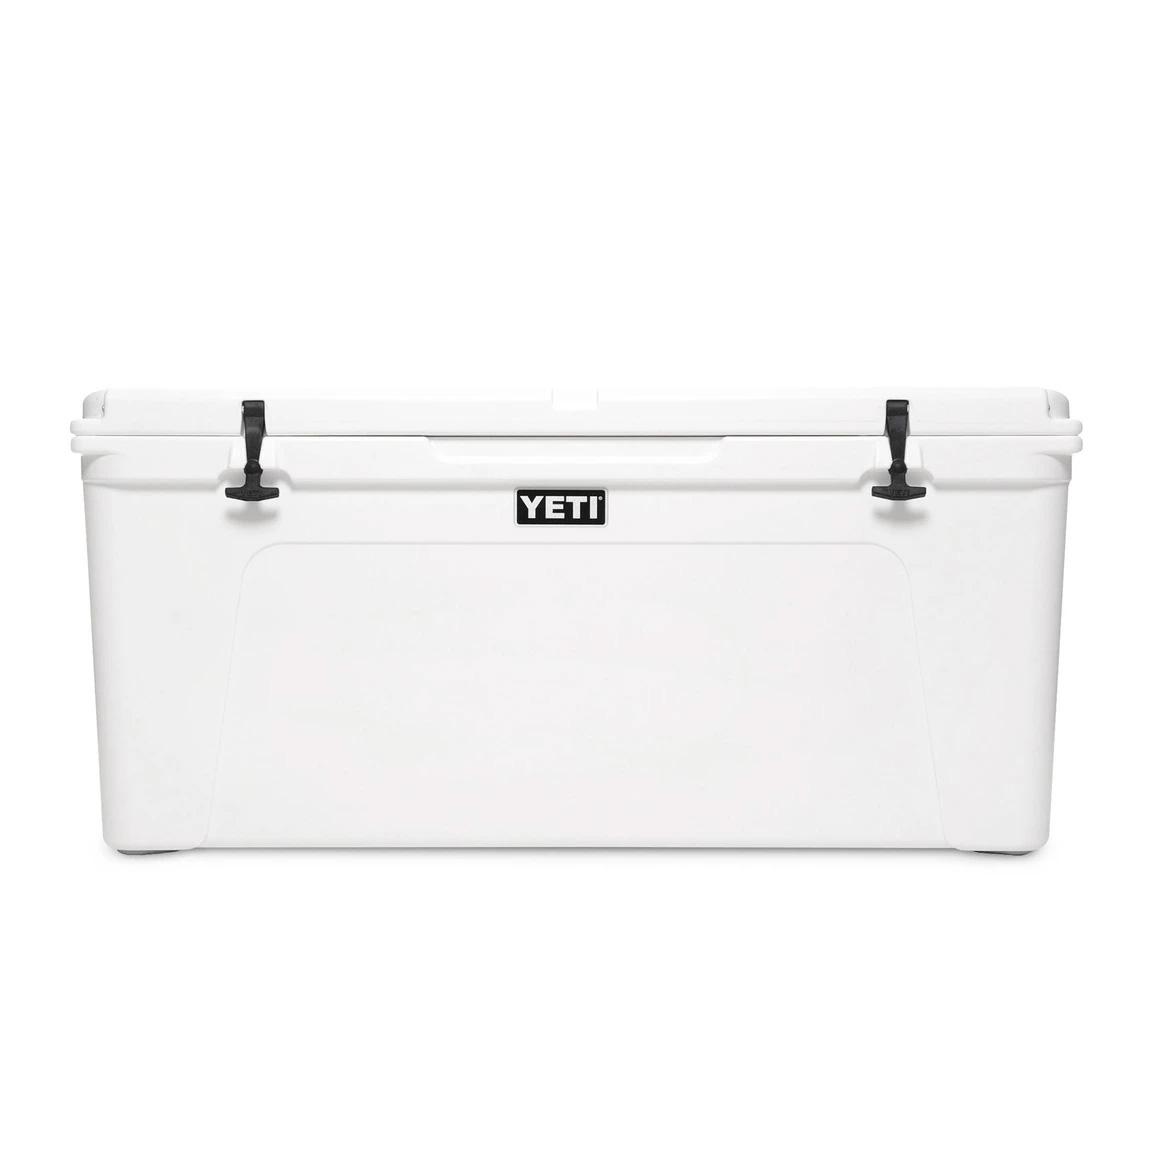 Yeti - Tundra 160 Hard Cooler